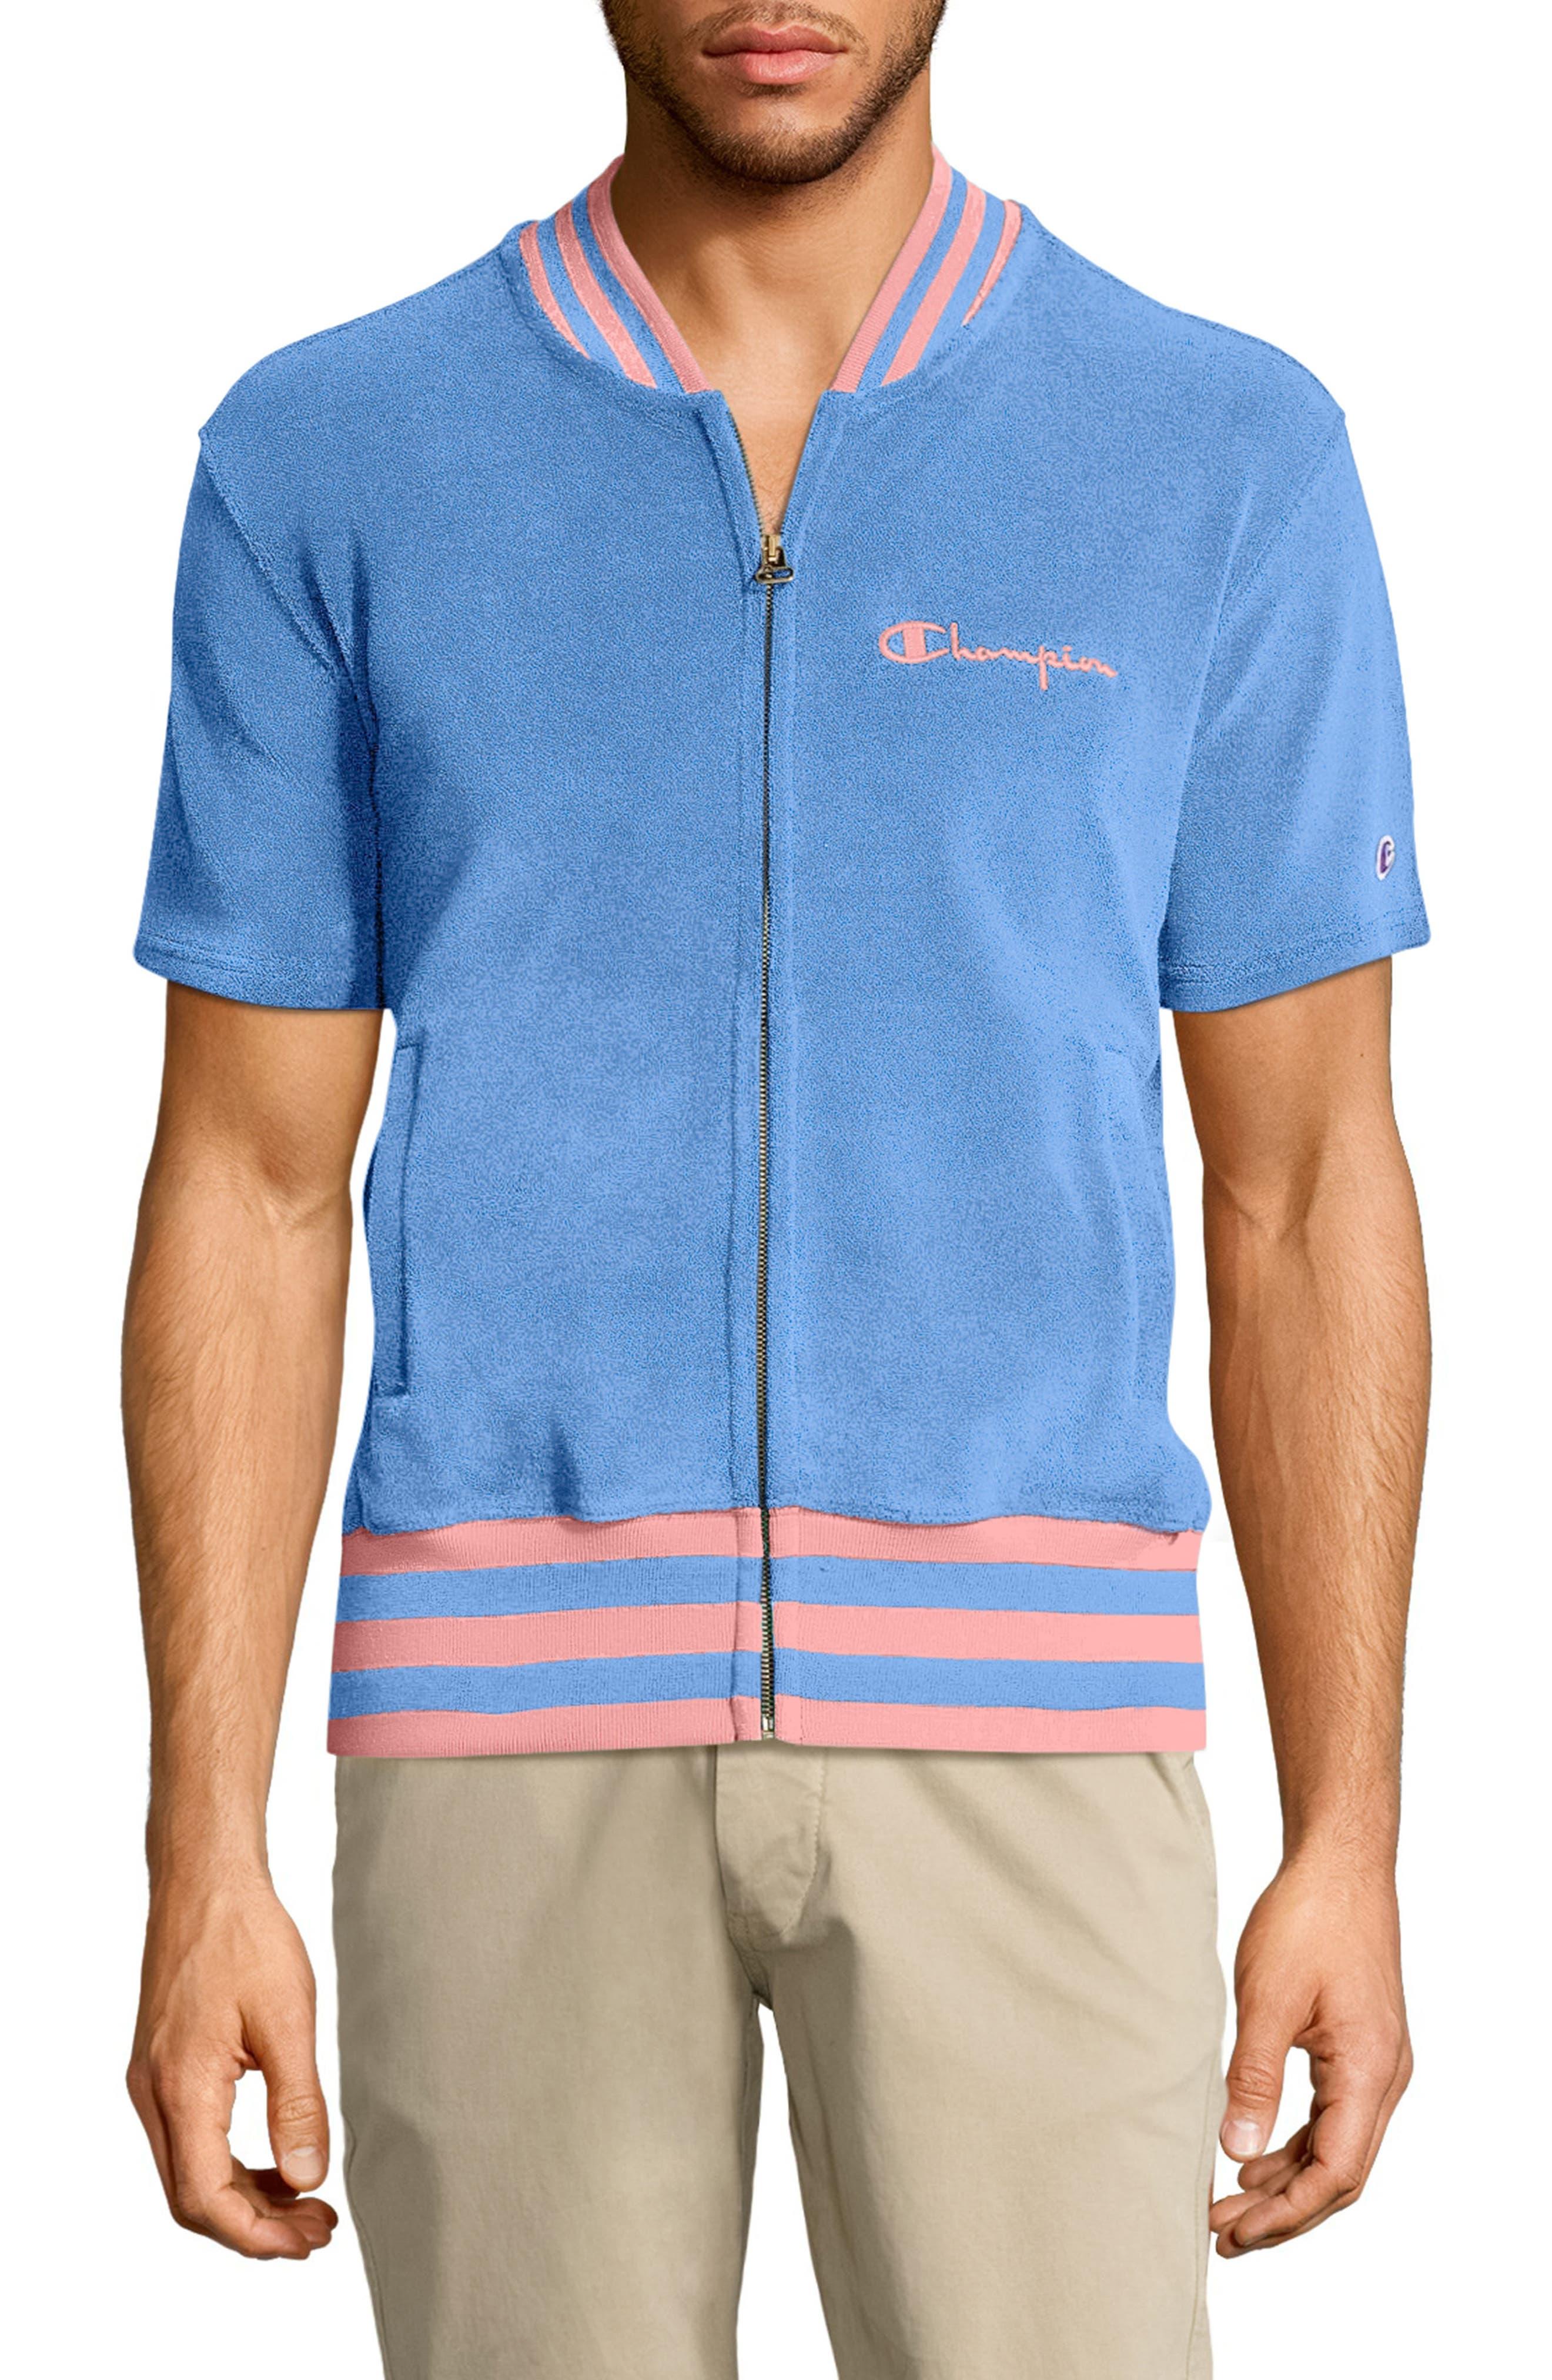 Sponge Terry Stripe Full Zip Sweatshirt,                             Main thumbnail 1, color,                             452